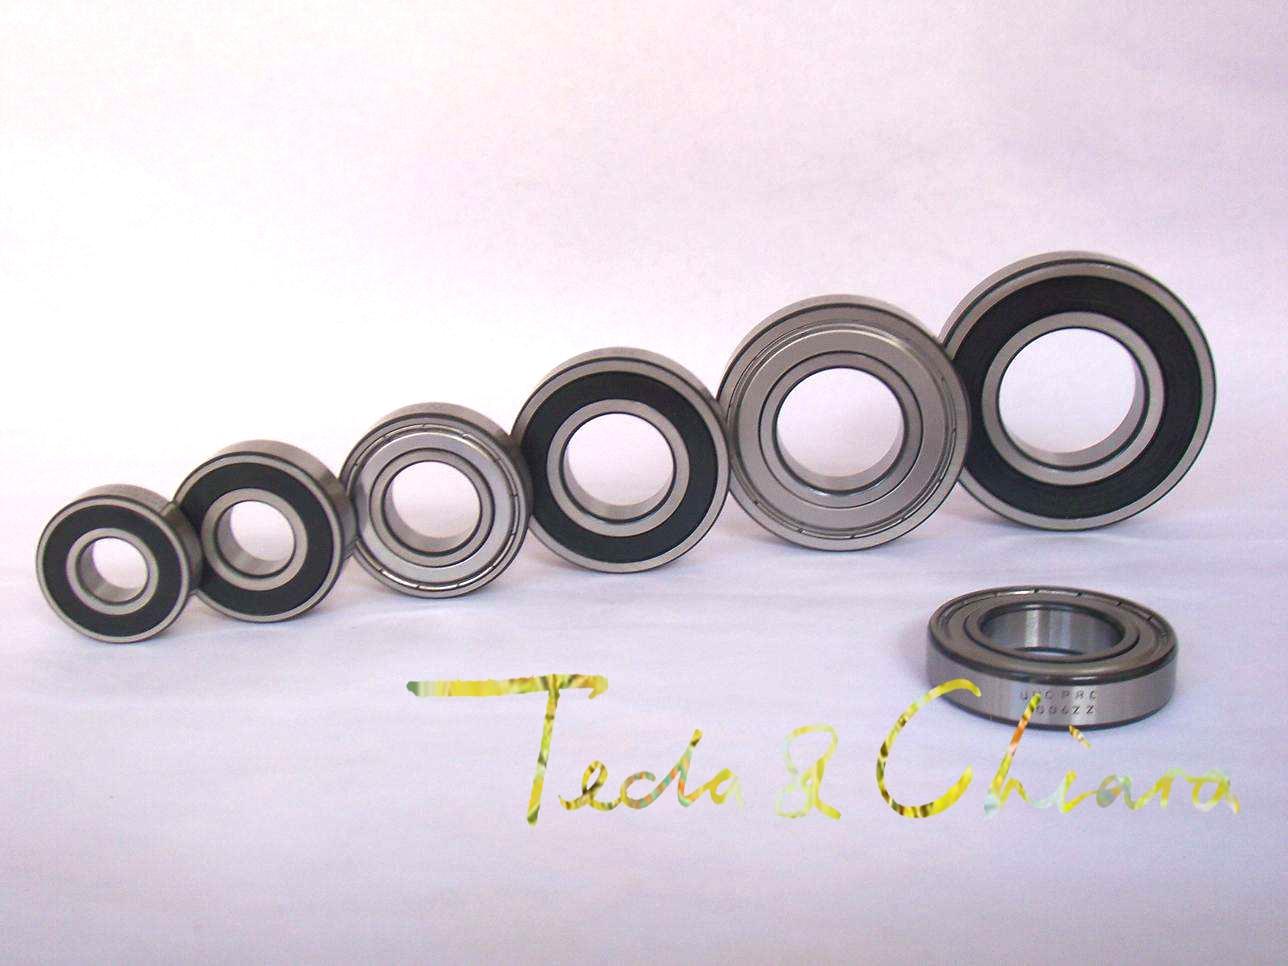 608 608ZZ 608RS 608-2Z 608Z 608-2RS ZZ RS RZ 2RZ AEBC-5 Deep Groove Ball Bearings 8 X 22 X 7mm